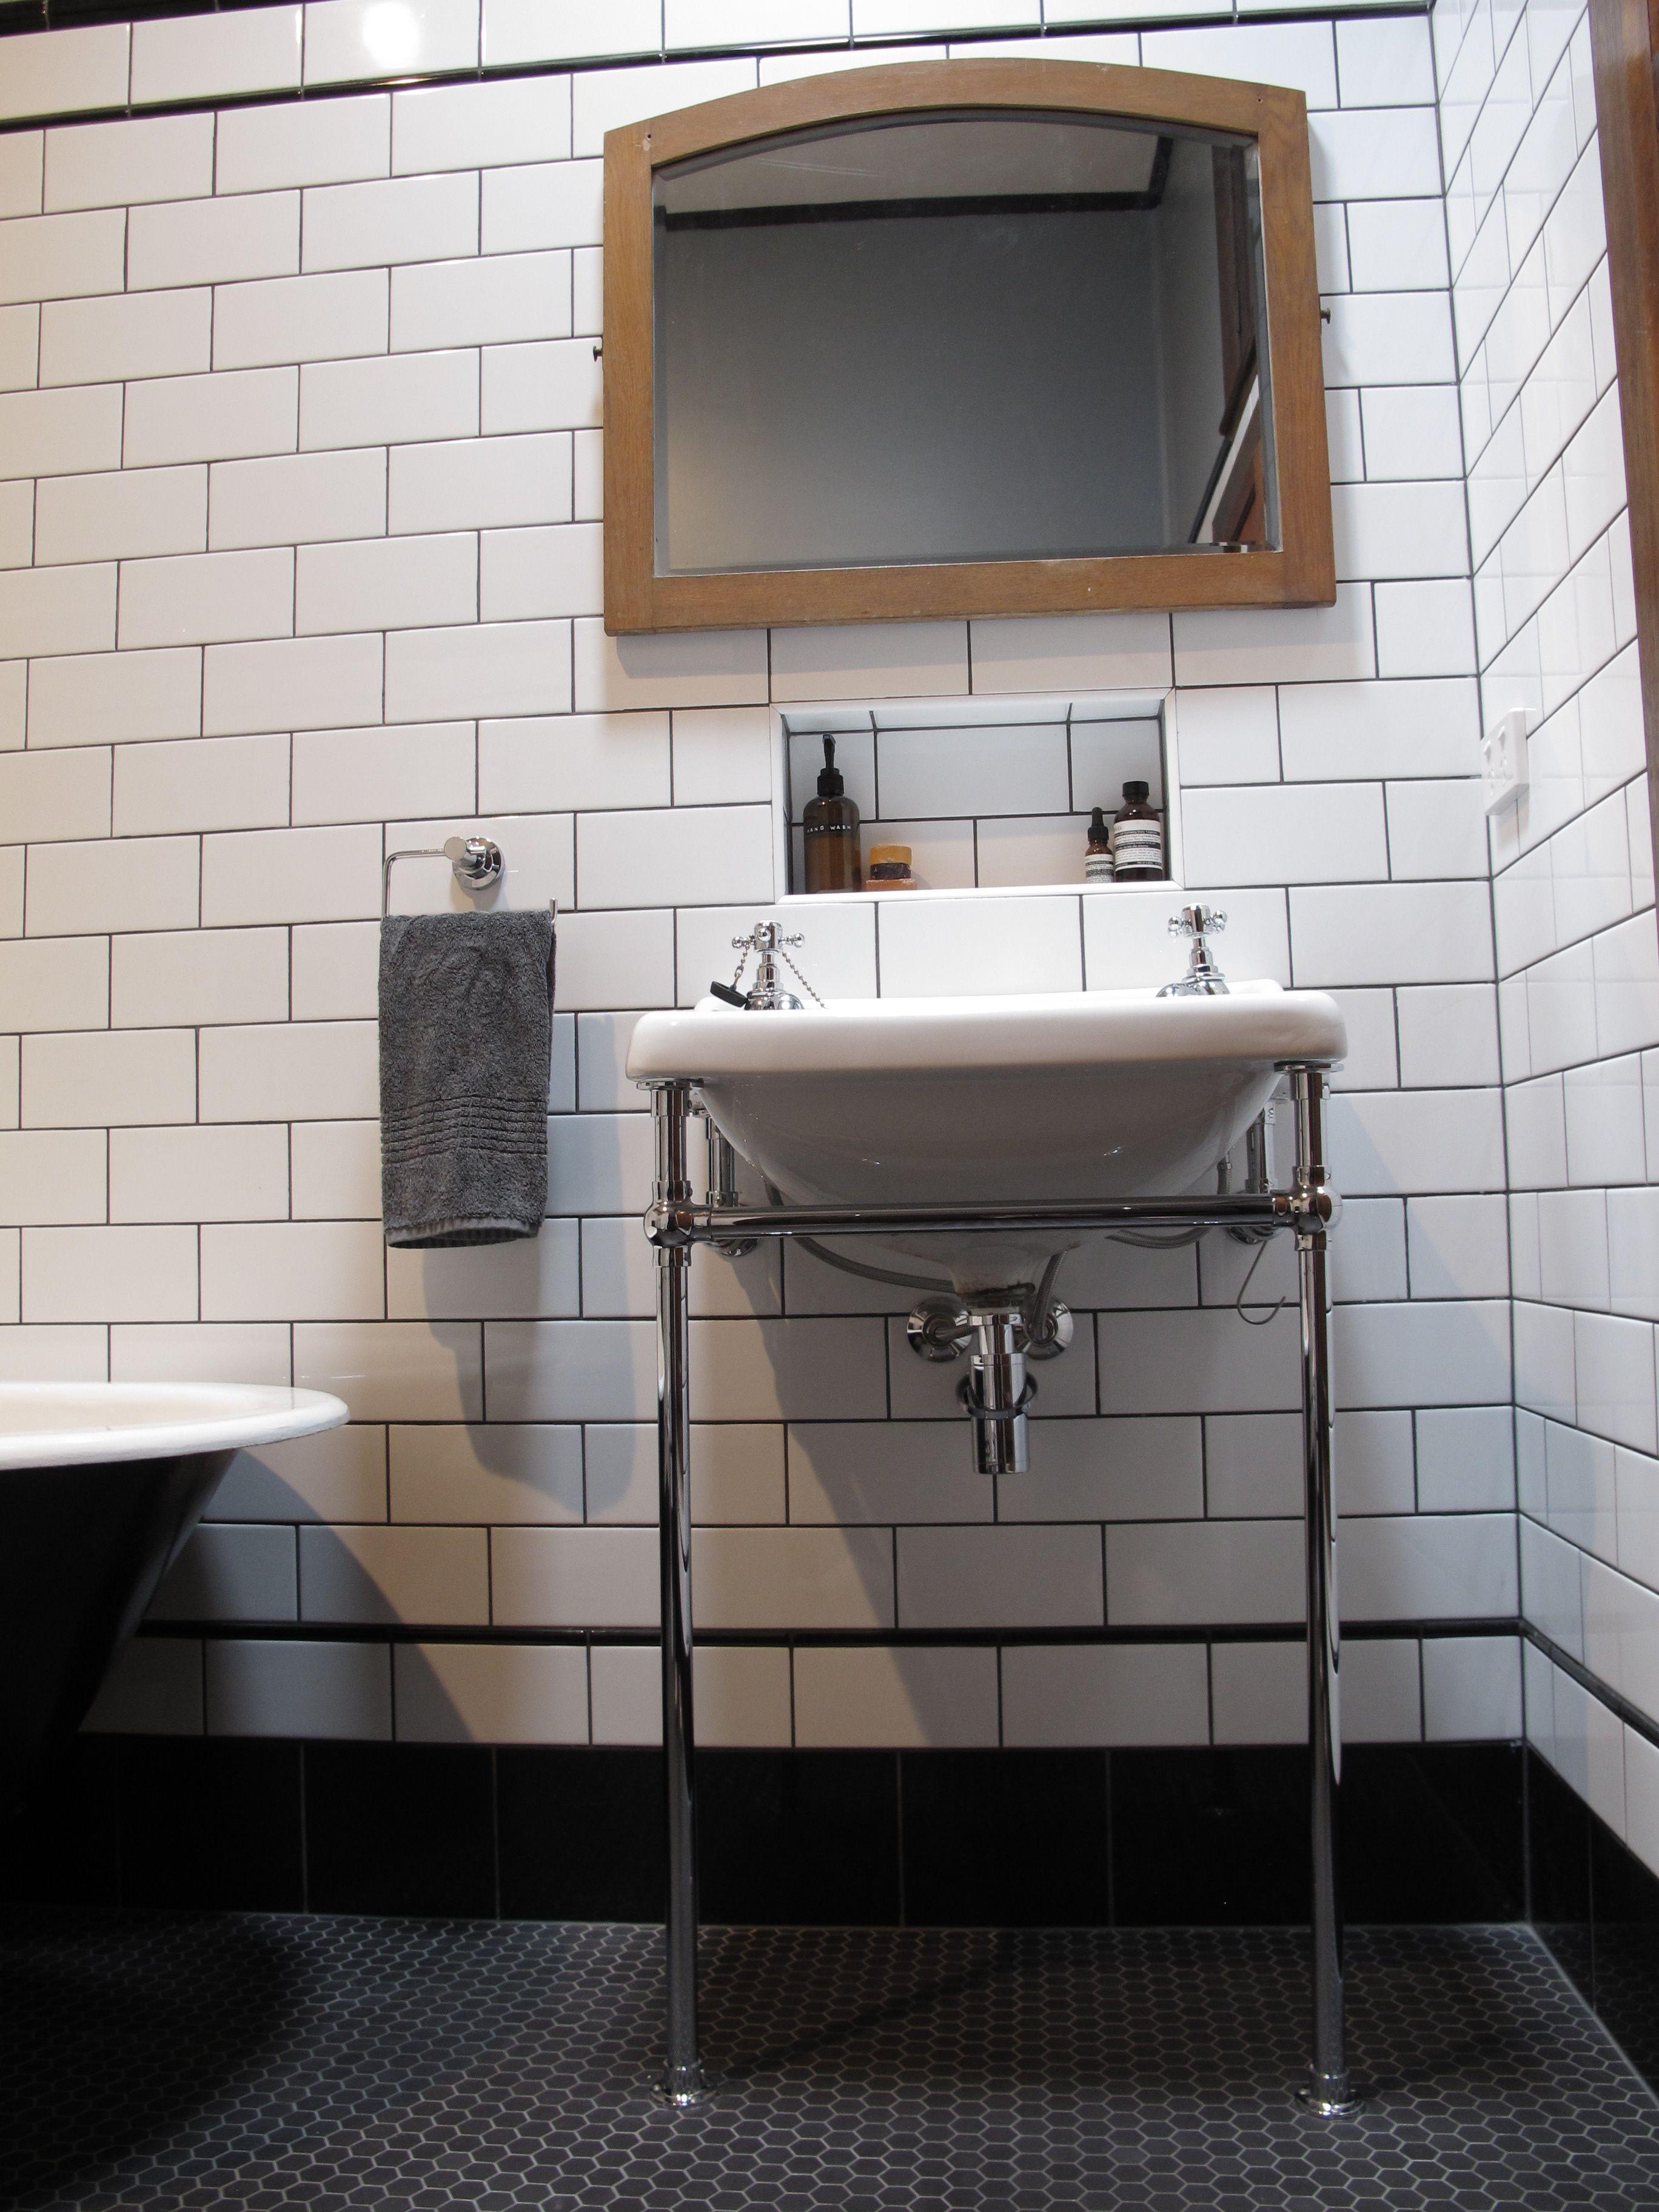 Charcoal grey bathroom tiles - Our Latest Bathroom Renovation Subway Tiles Black Border And Pencil Tiles Grey Grout